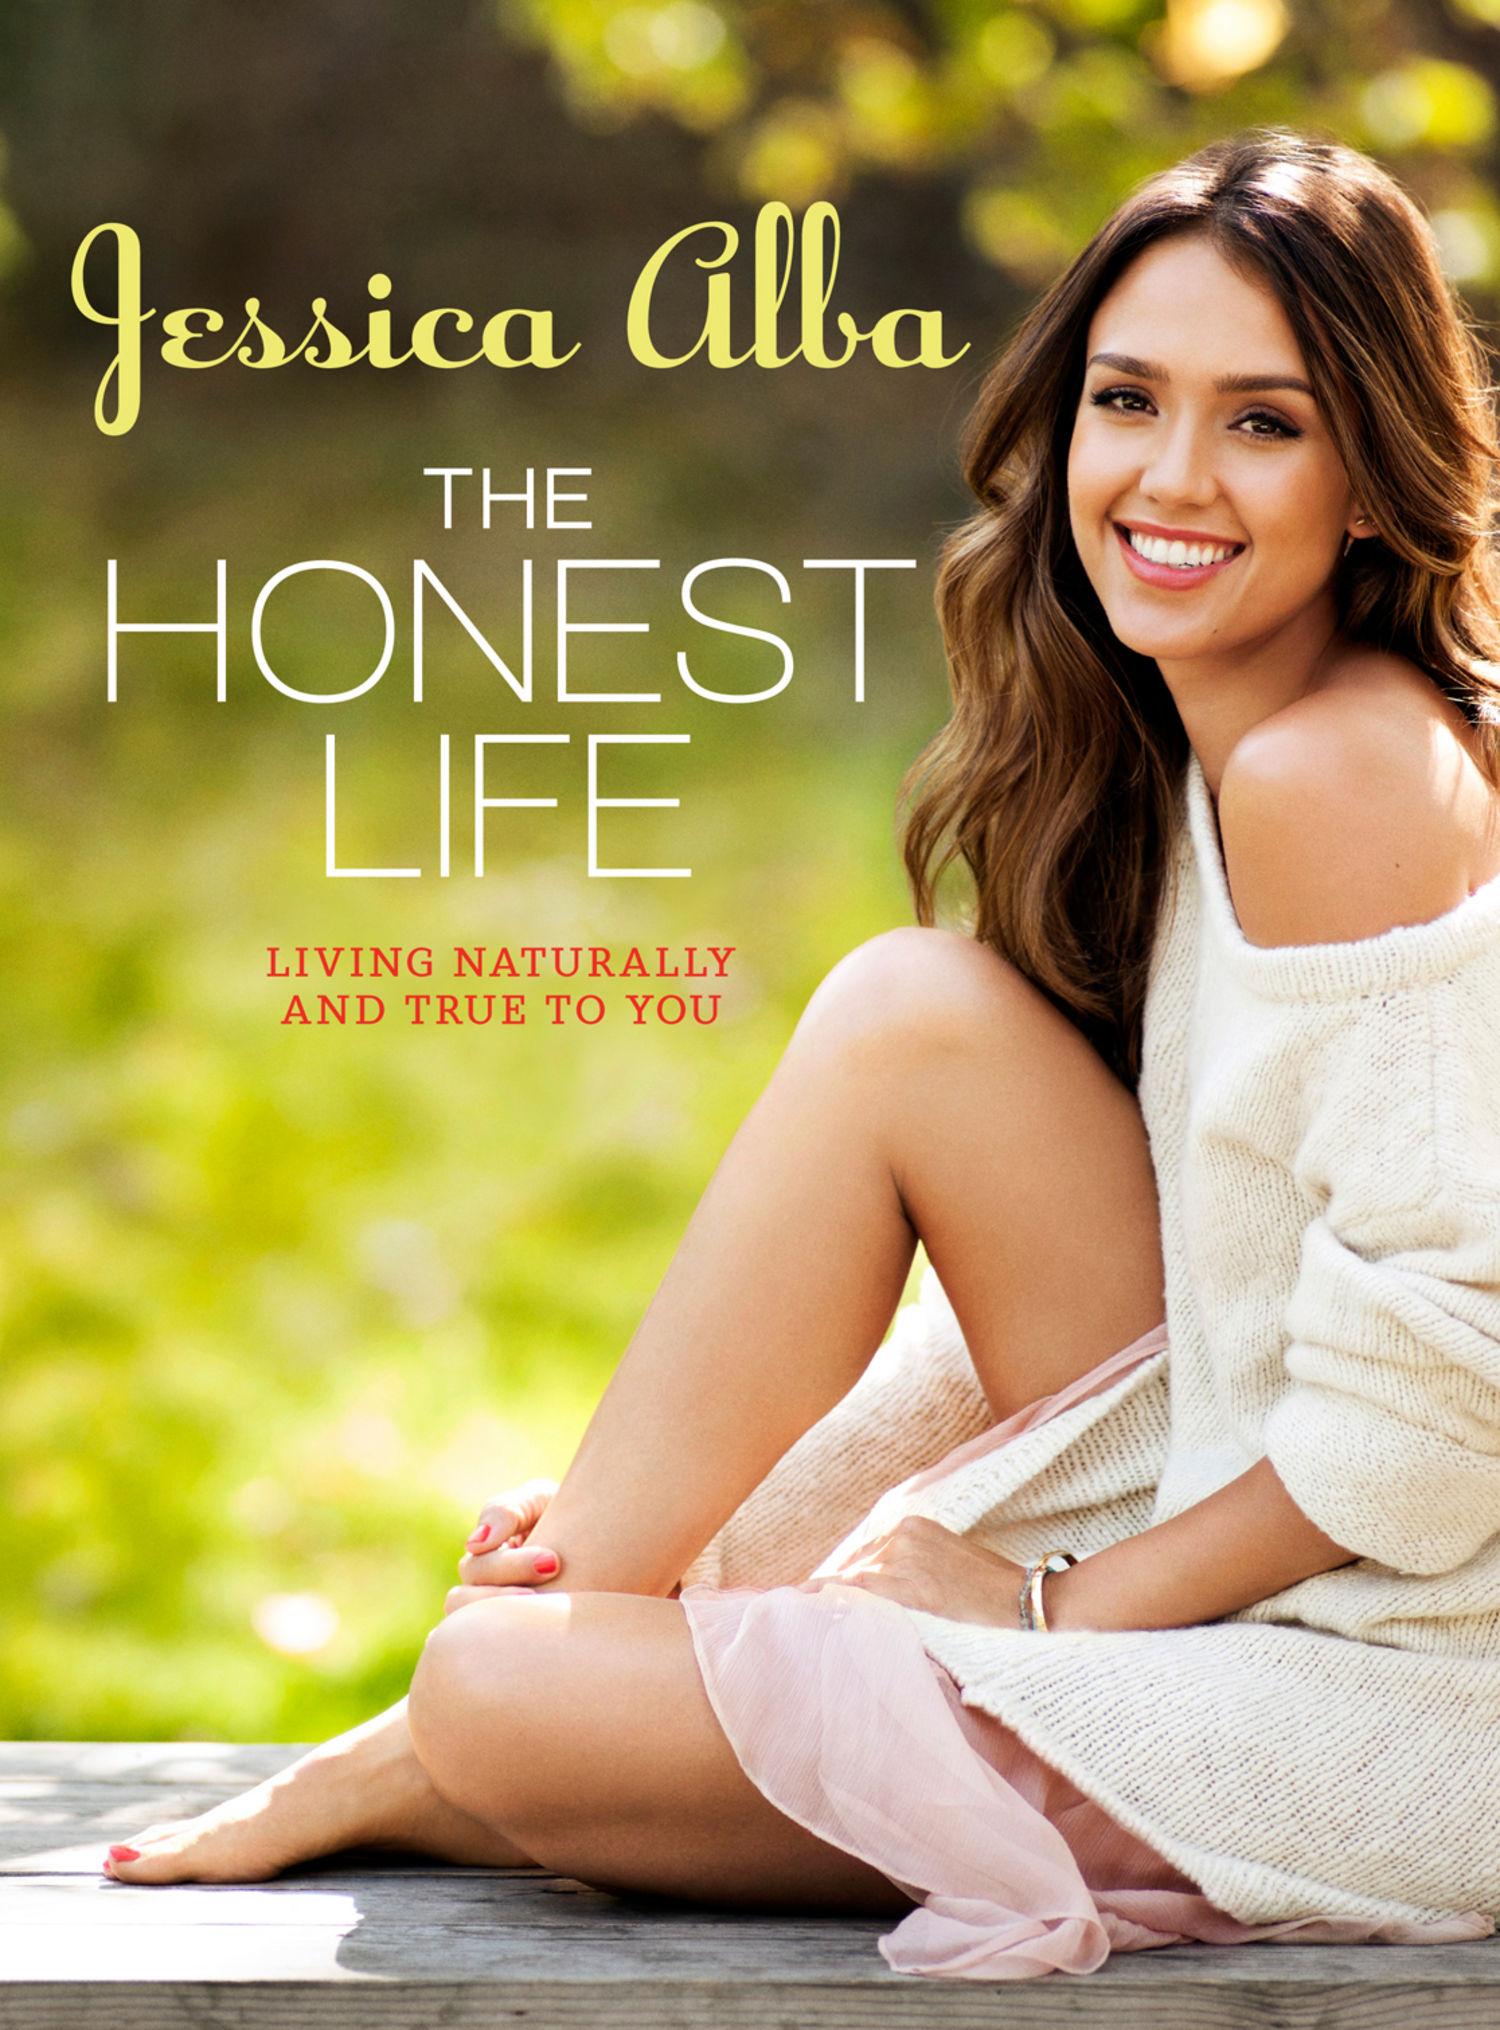 The Honest life   Jessica Alba